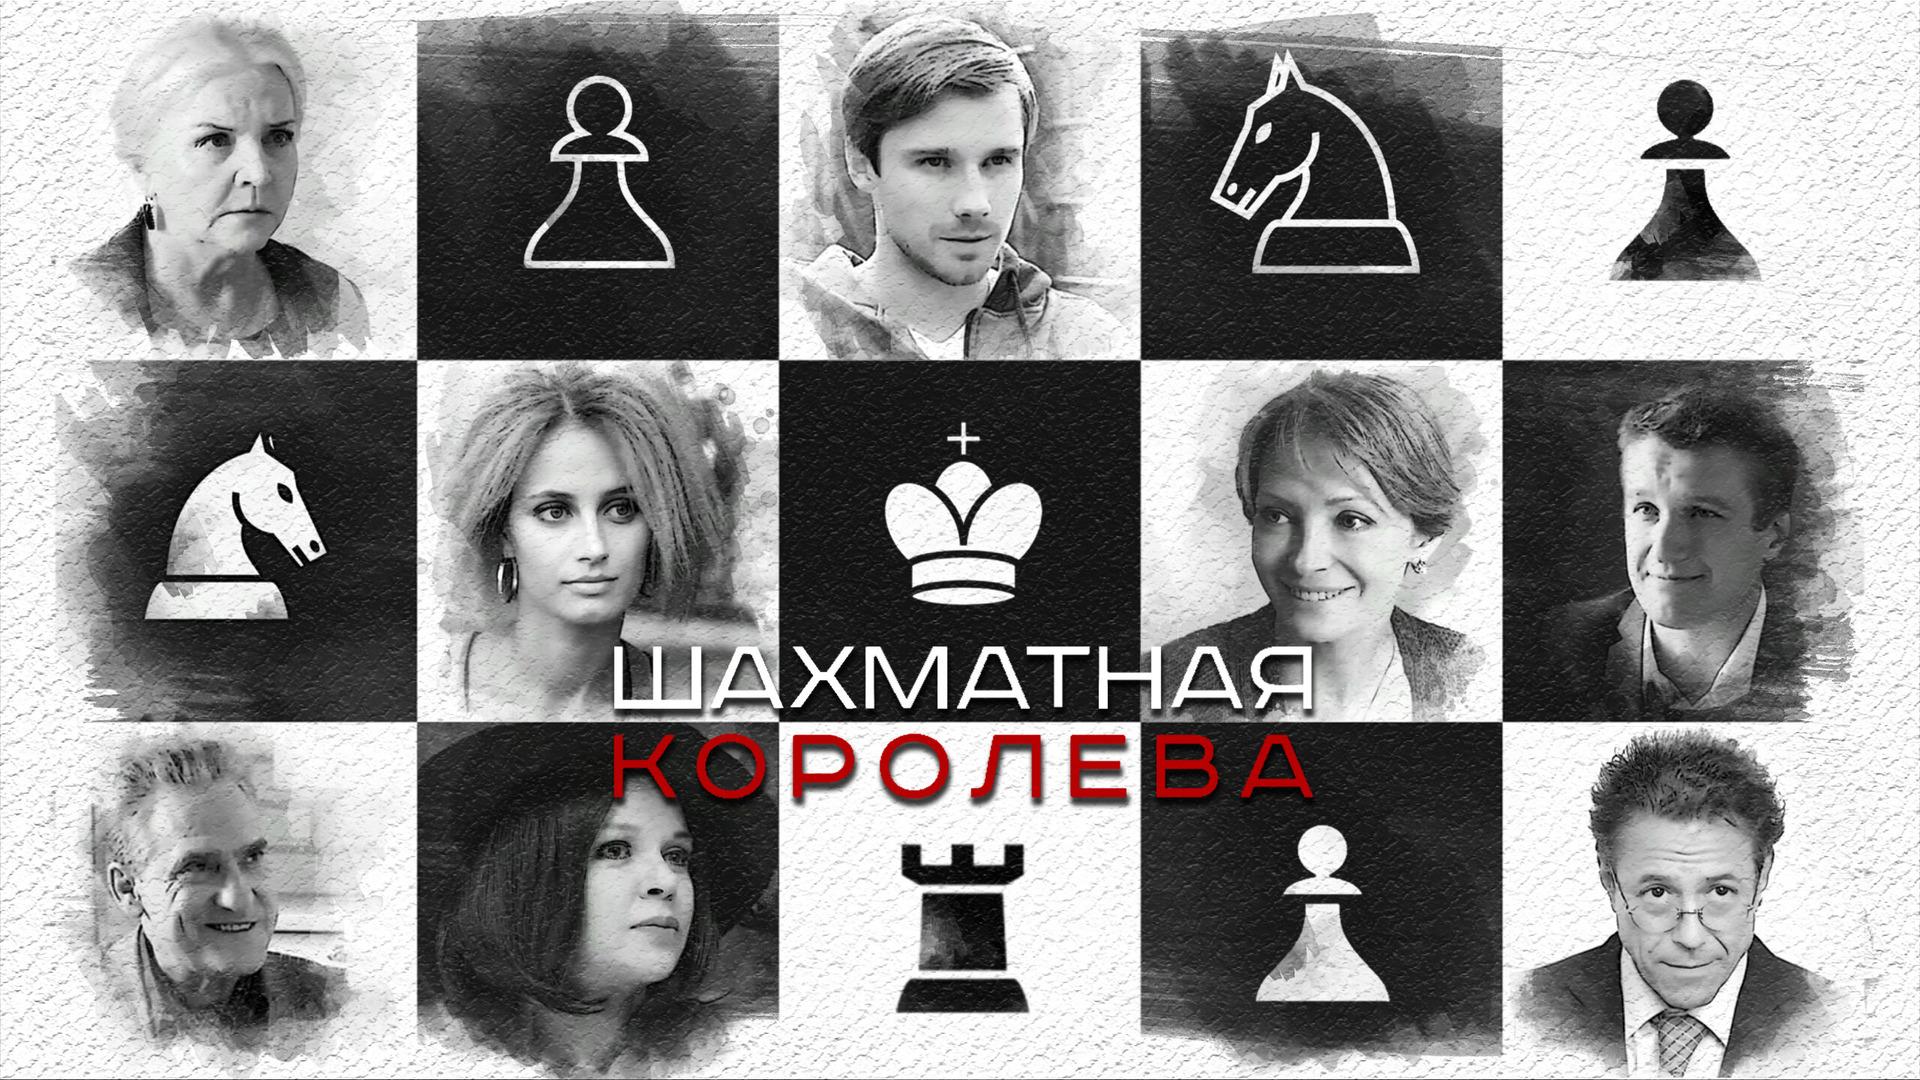 Show Шахматная королева